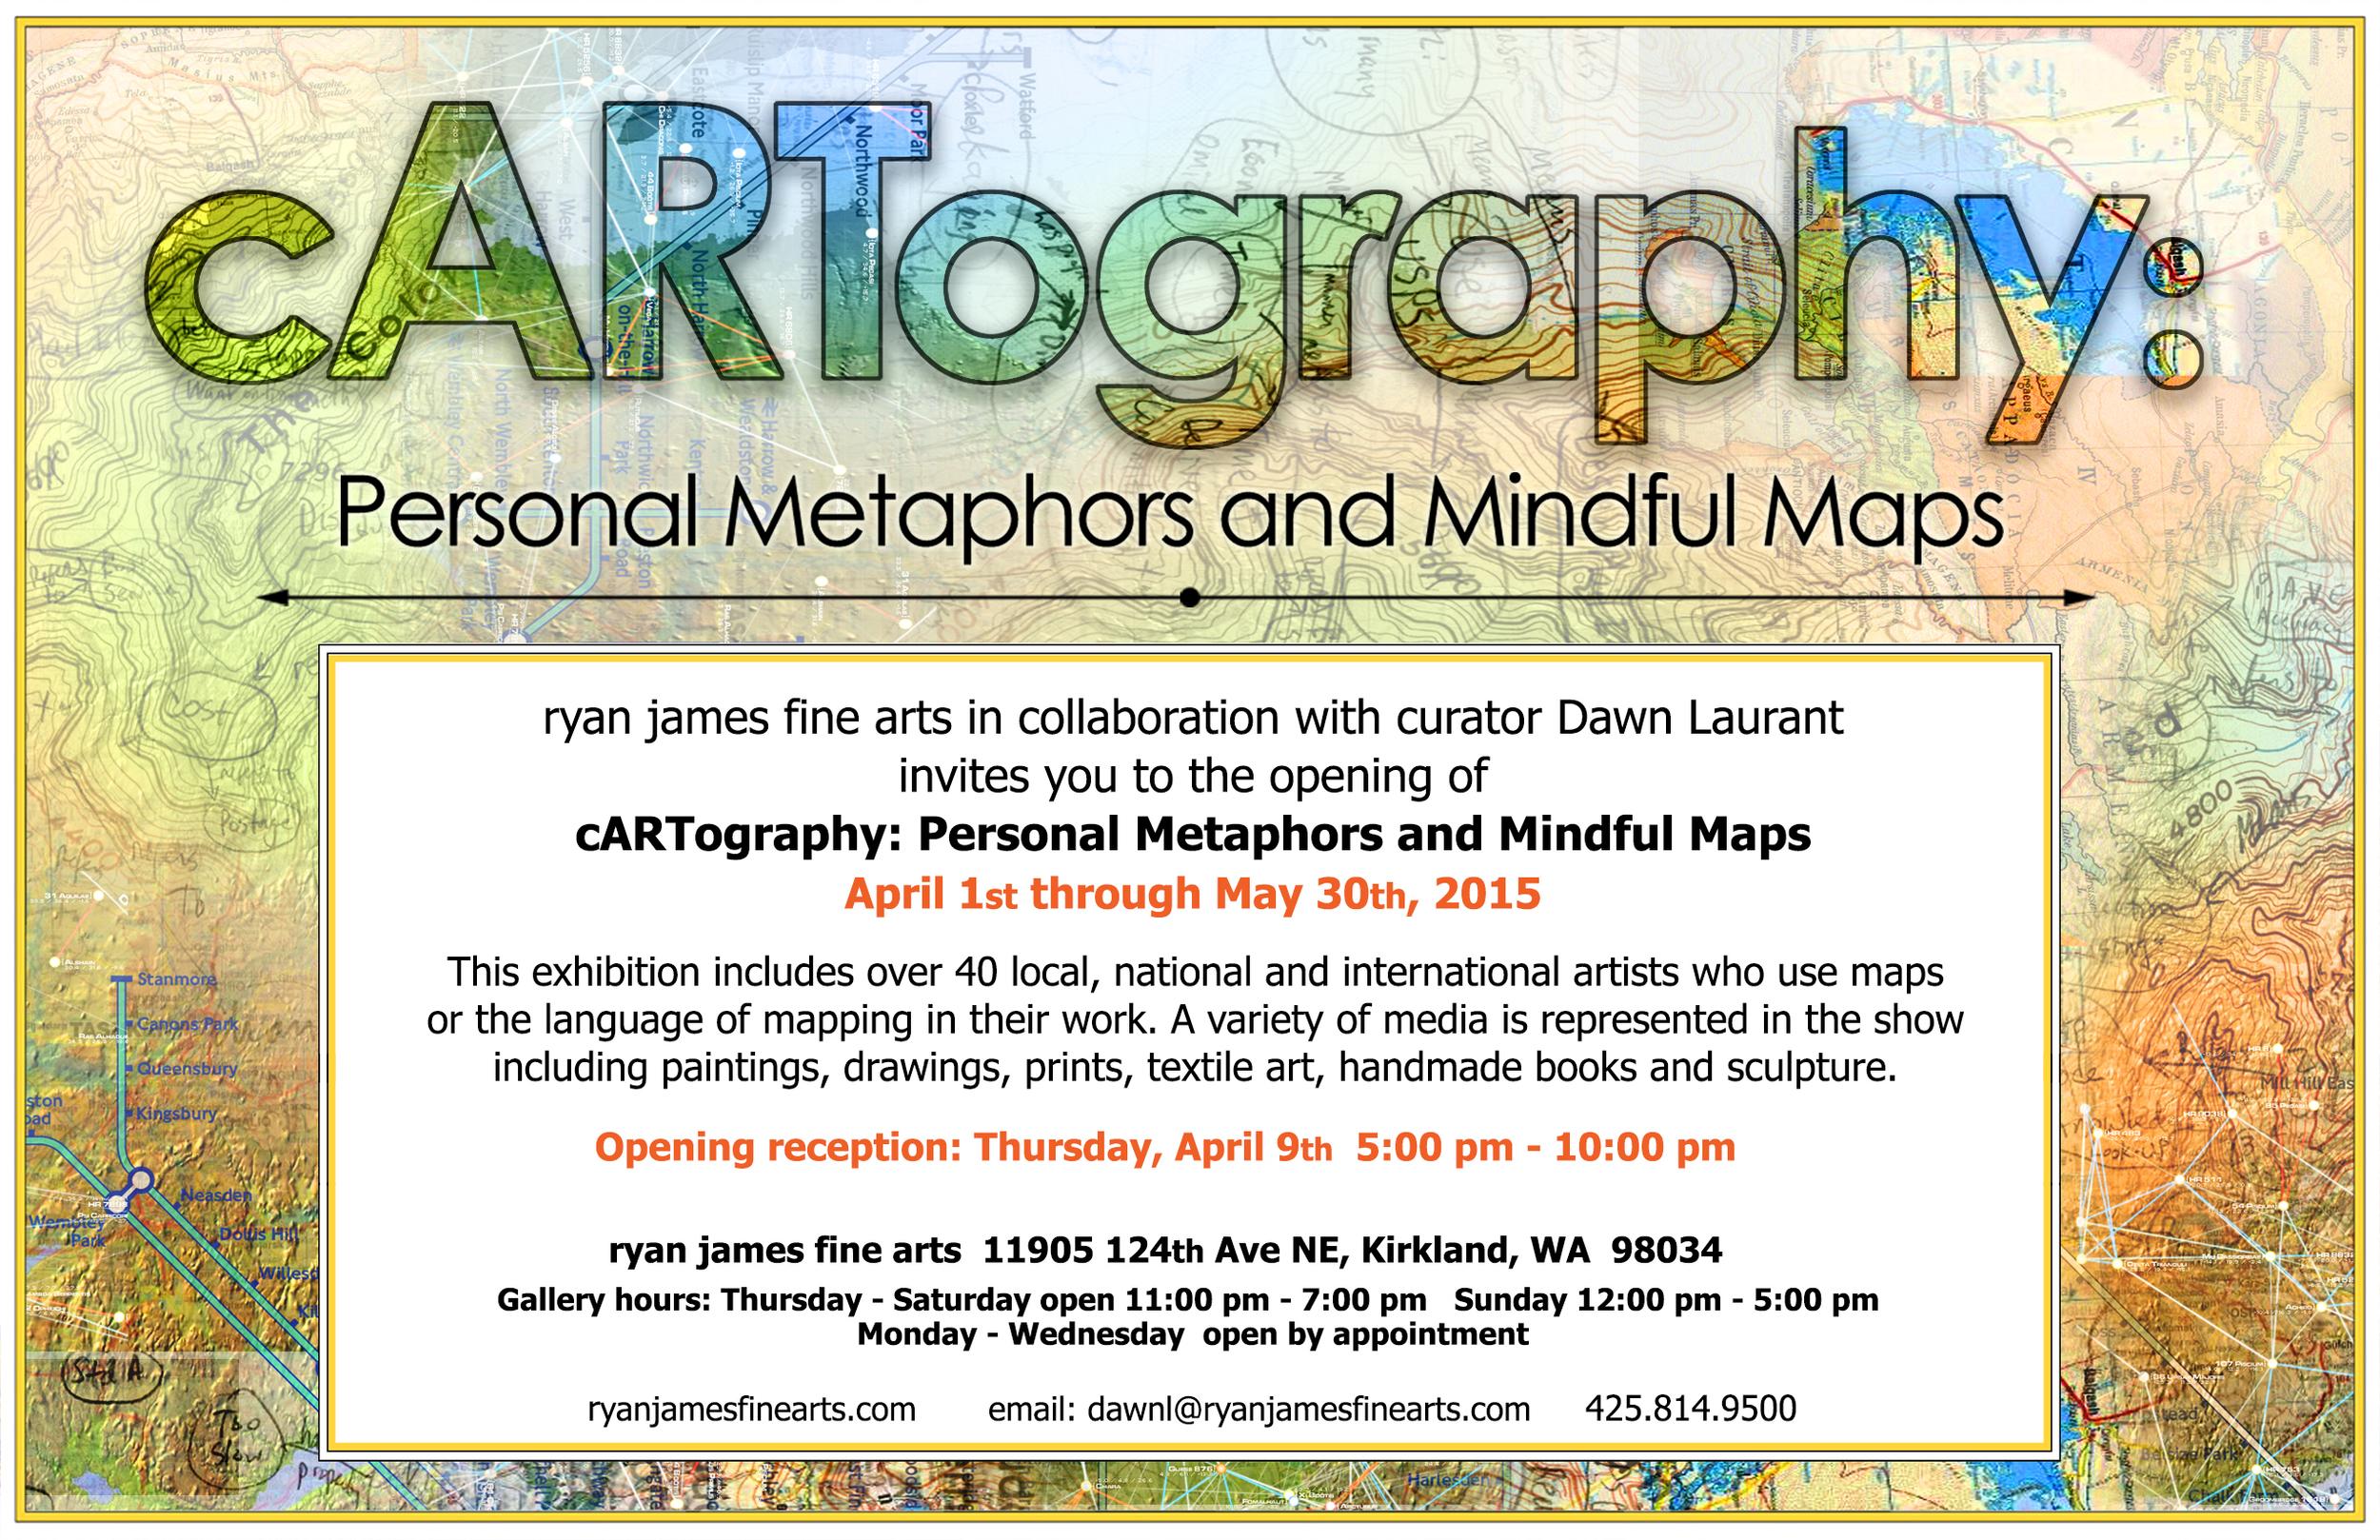 cARTography at Ryan James Fine Arts